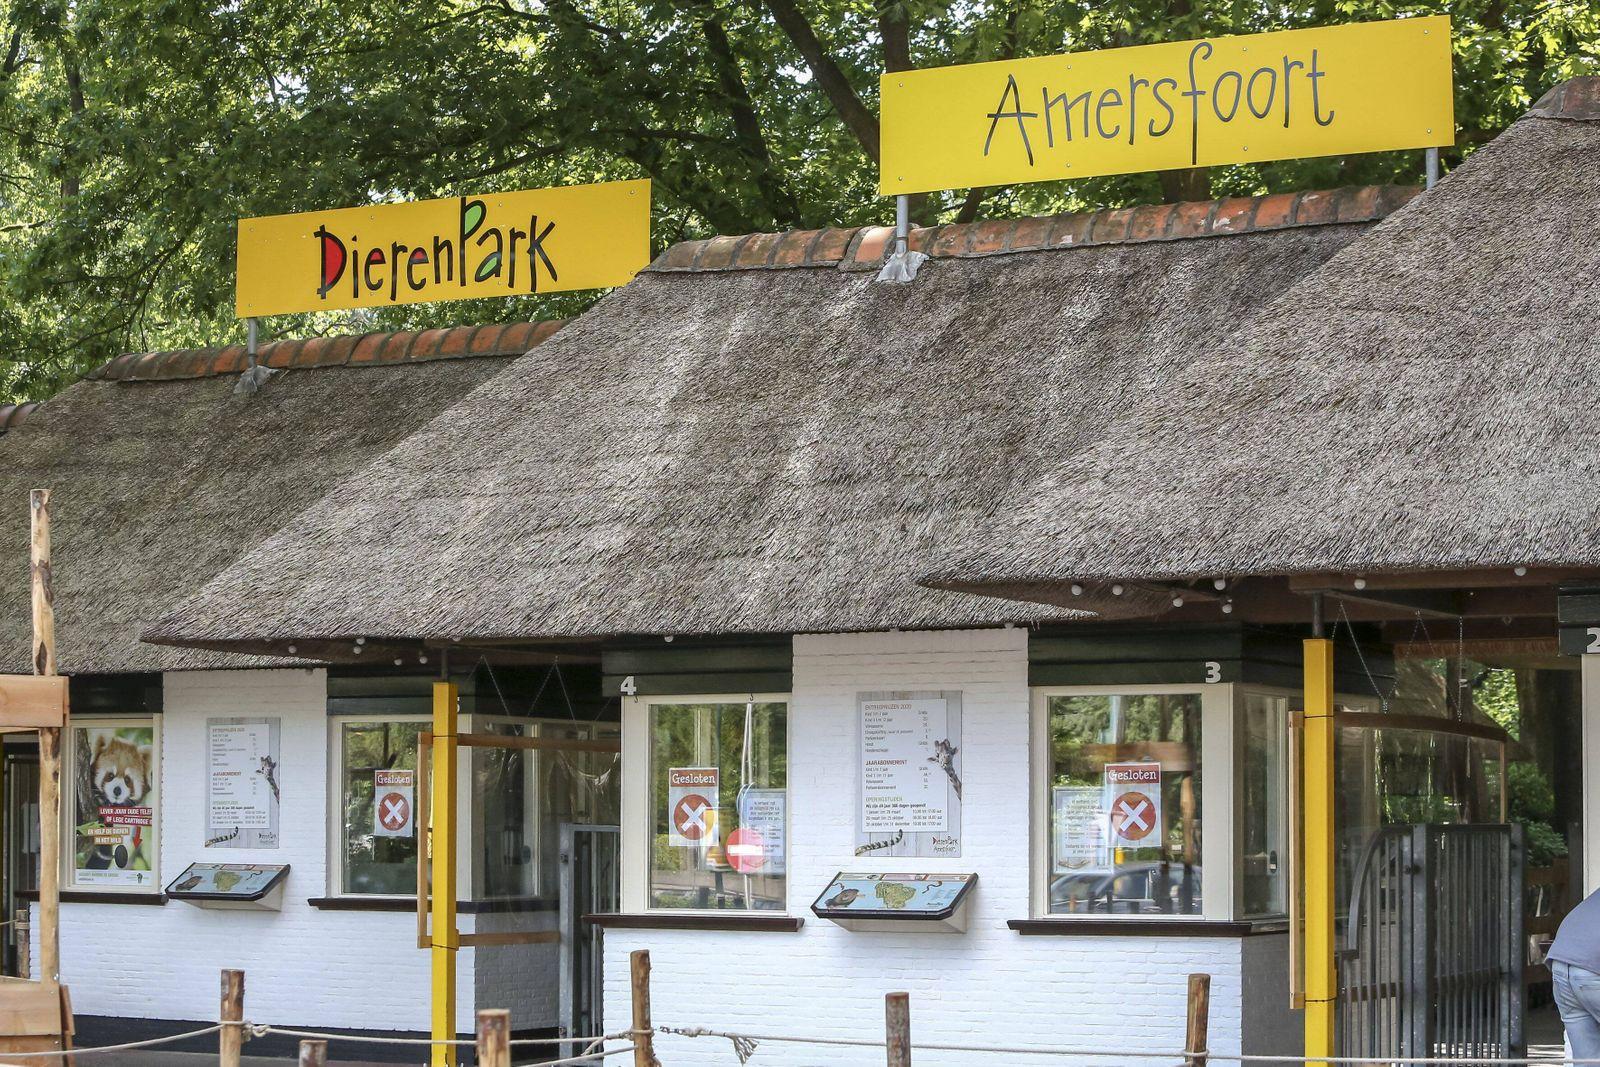 AMERSFOORT, 25-06-2020 ,Dierenpark Amersfoort Dutchnews, entrance of Amersfoort zoo ingang dierenpark Amersfoort ice cre